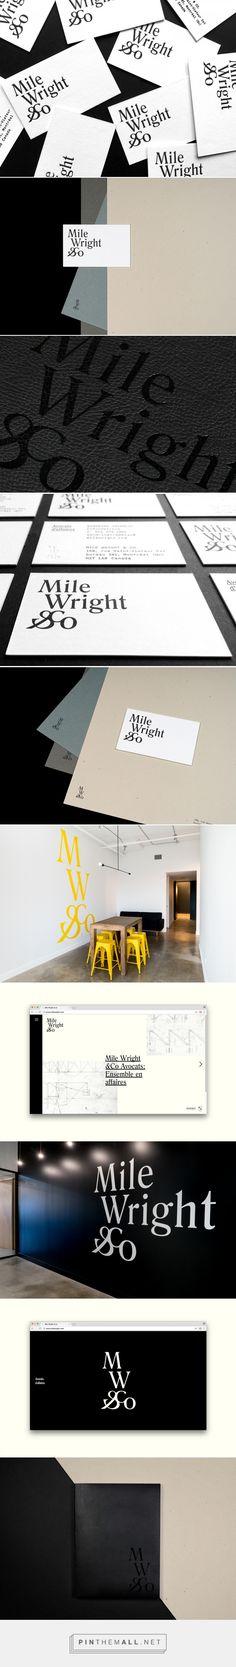 Mile Wright & Co. Brand identity, visual identity, branding, classic, simple, minimal.